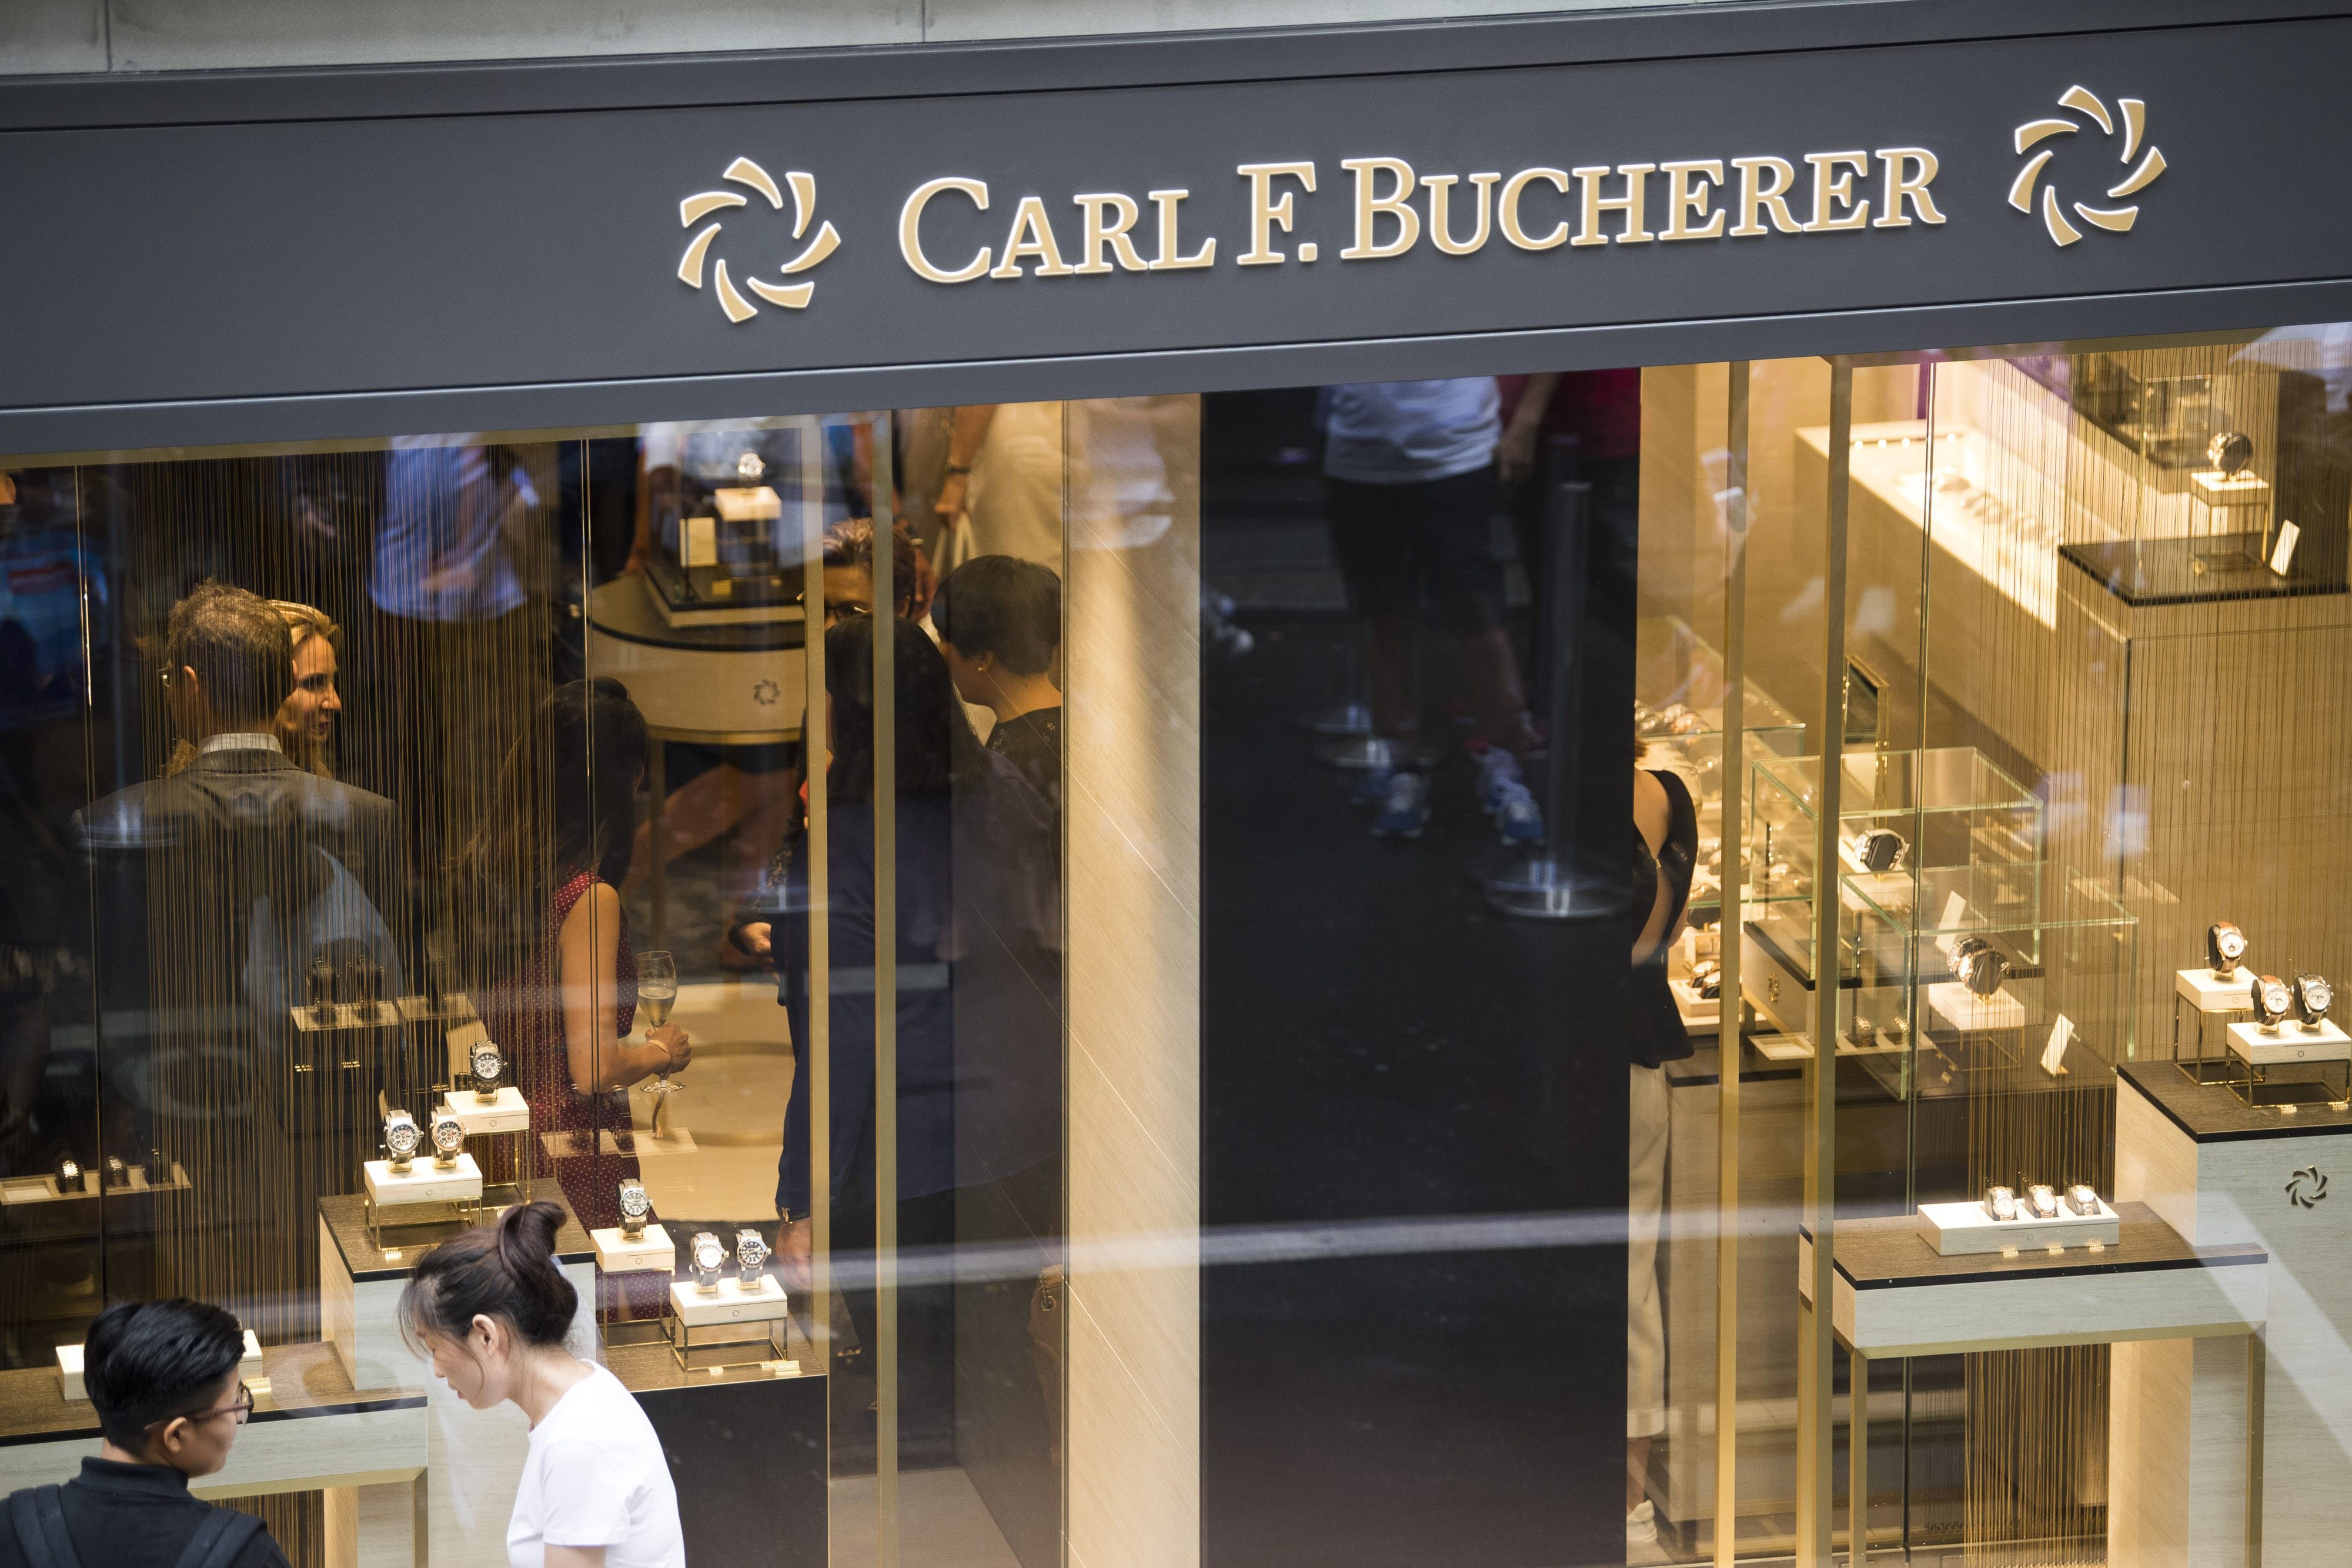 Carl F.Bucherer-Boutique in Luzern